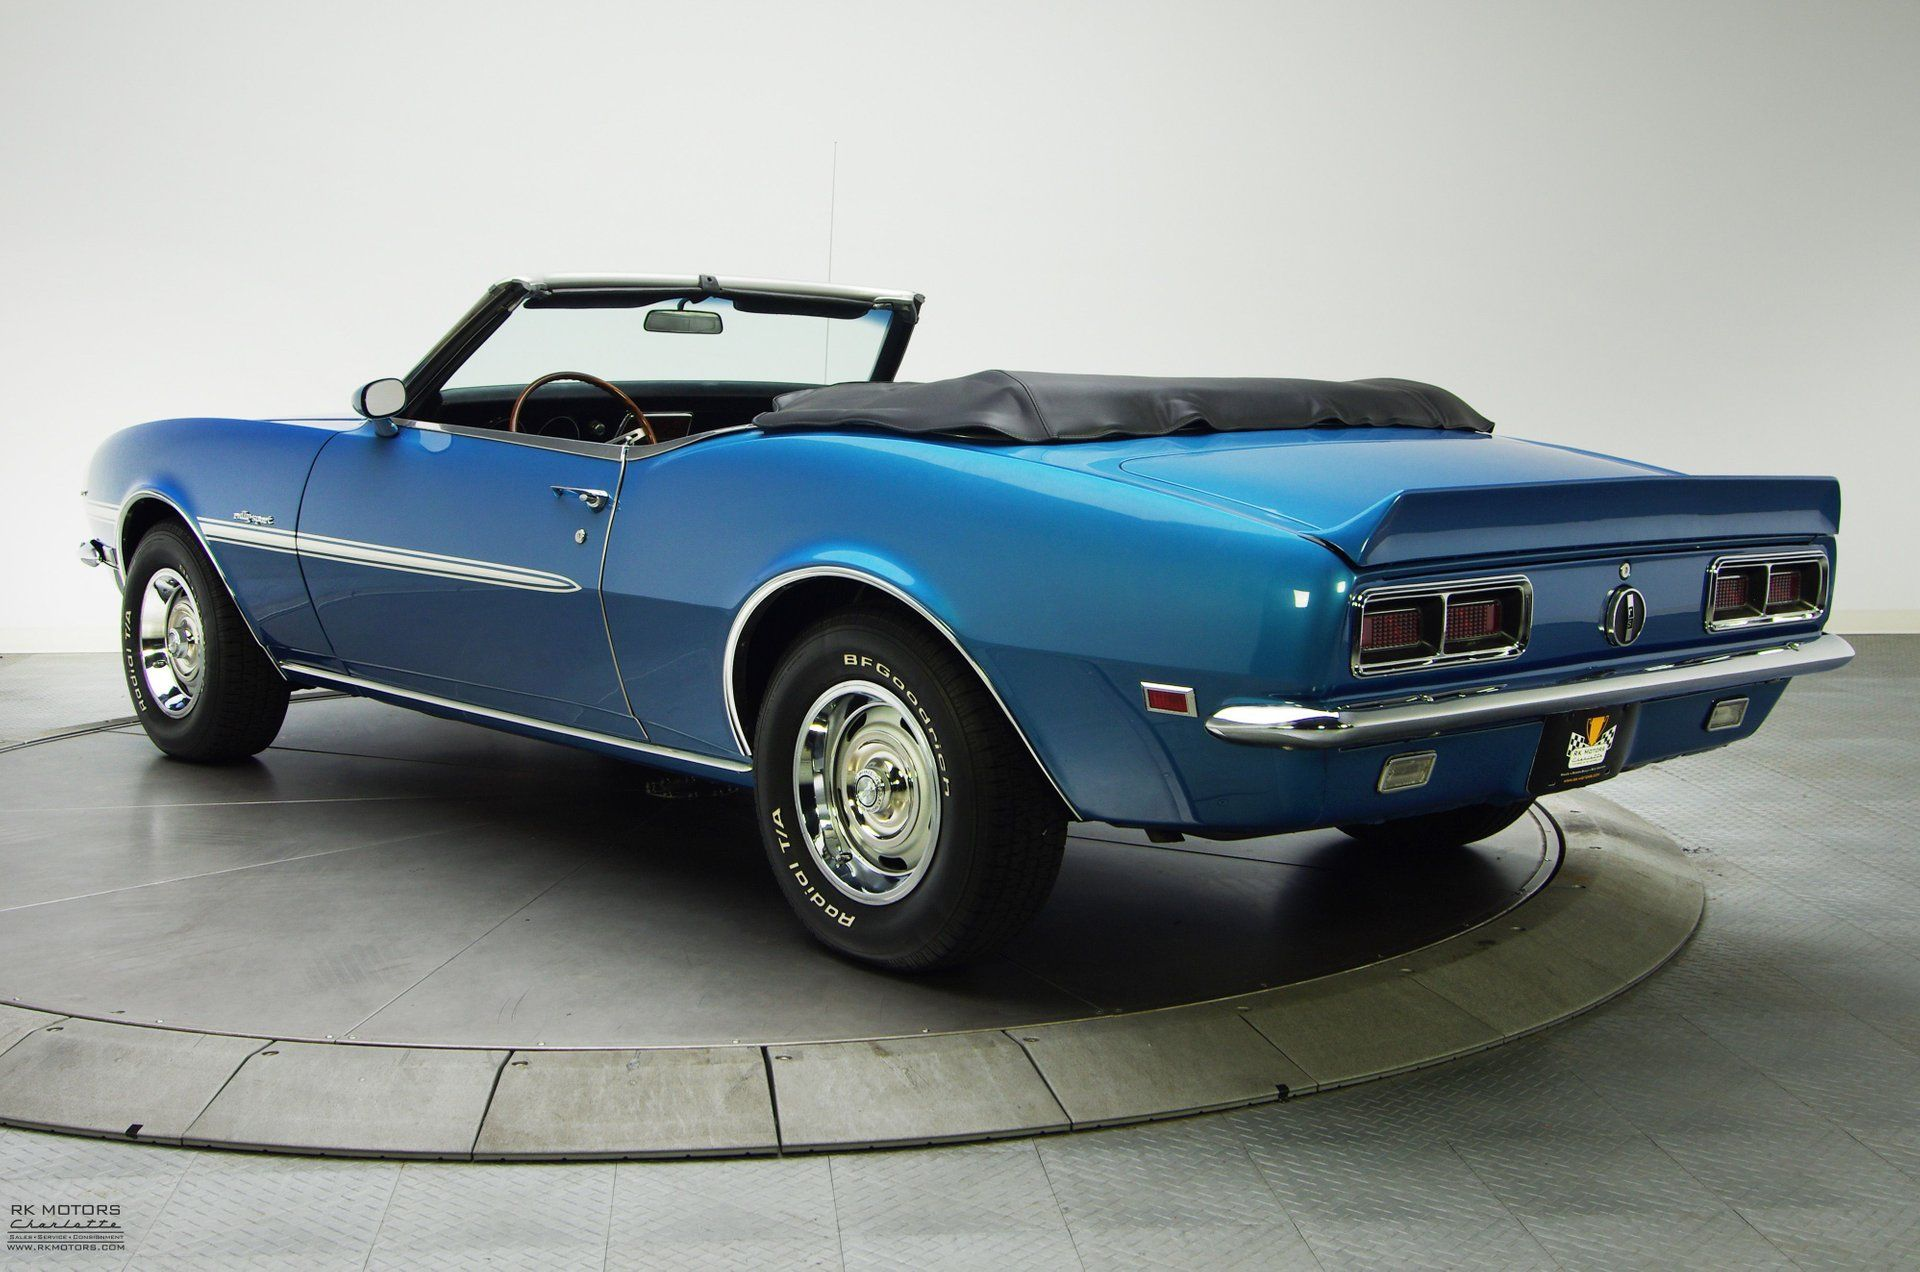 132543 1968 chevrolet camaro rk motors classic cars and